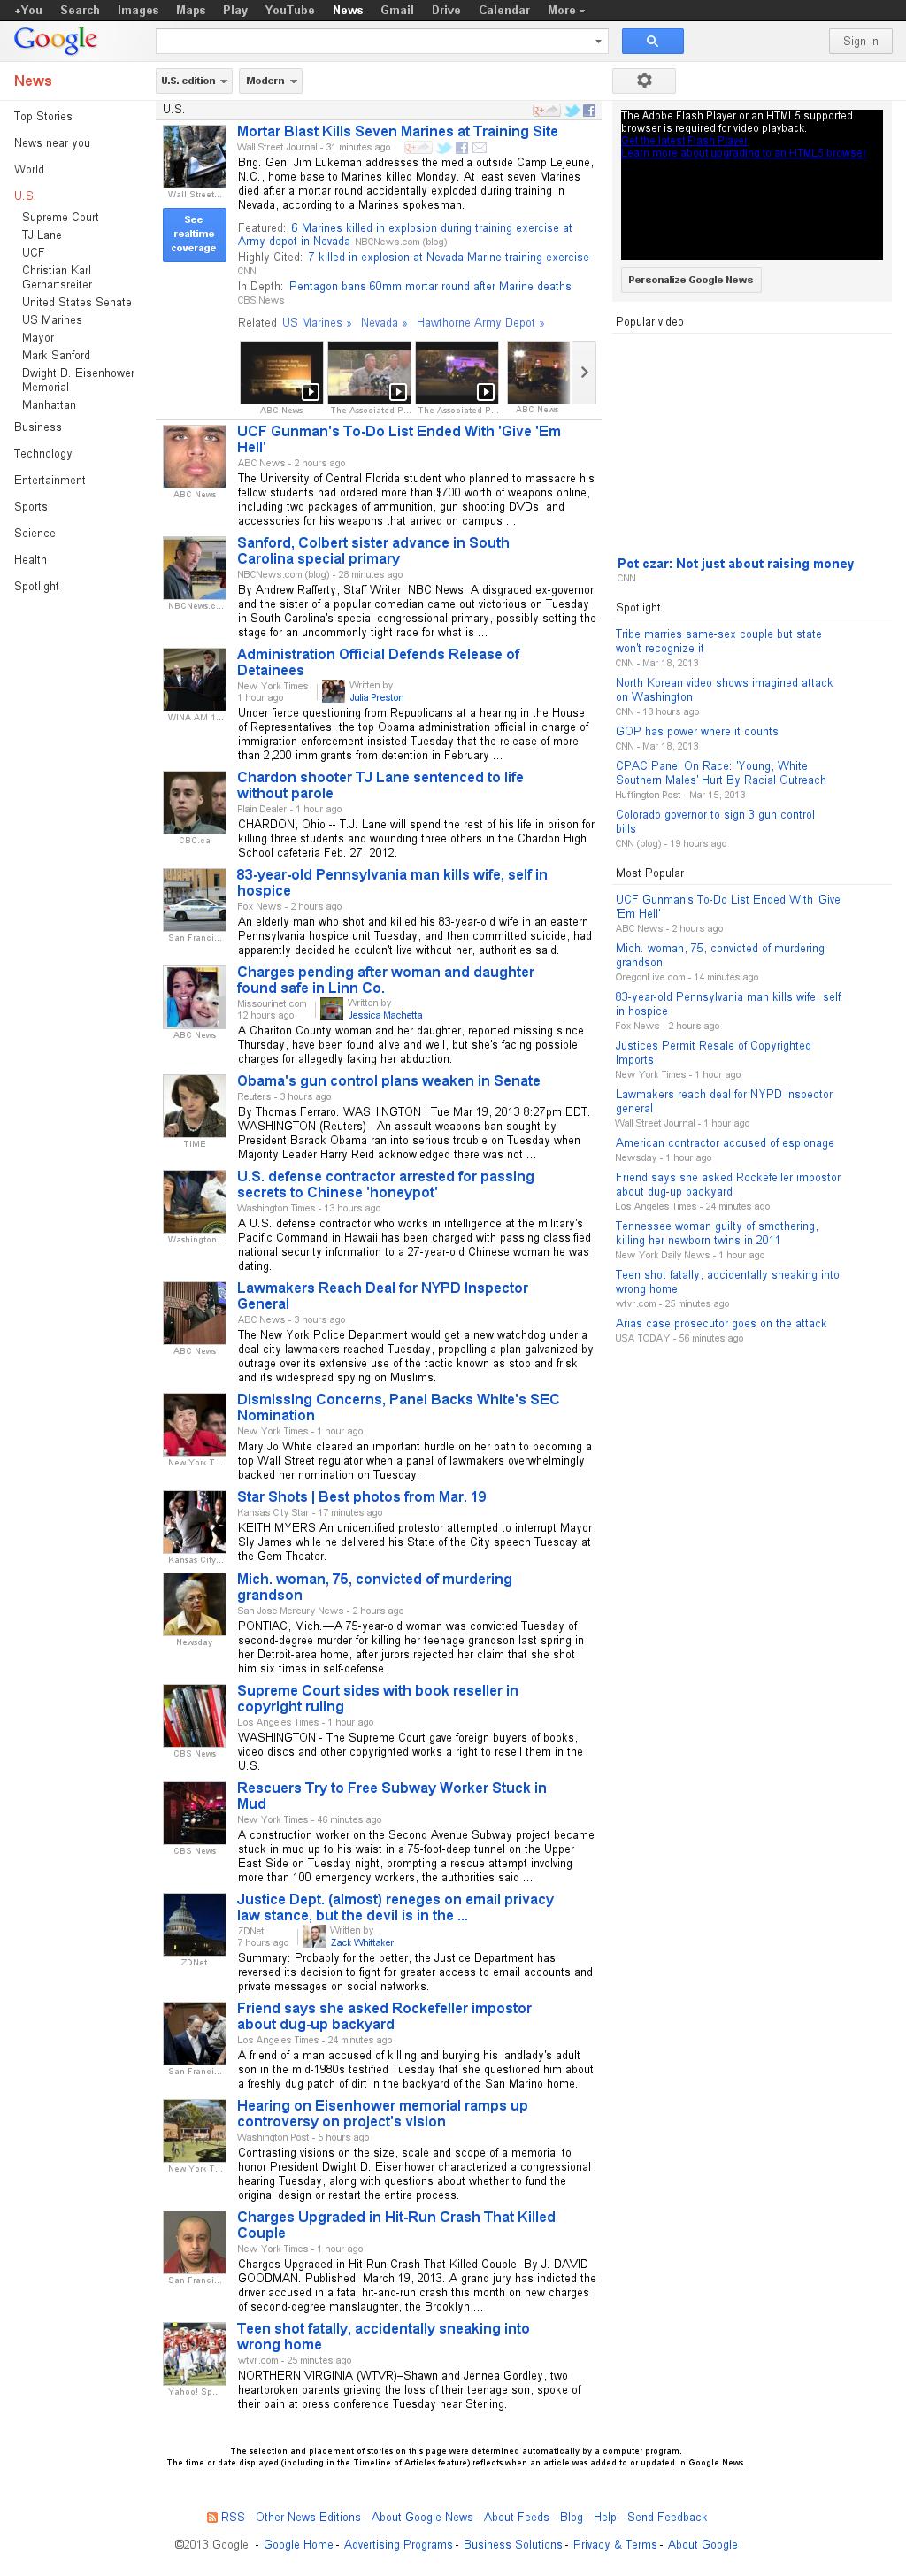 Google News: U.S. at Wednesday March 20, 2013, 4:11 a.m. UTC